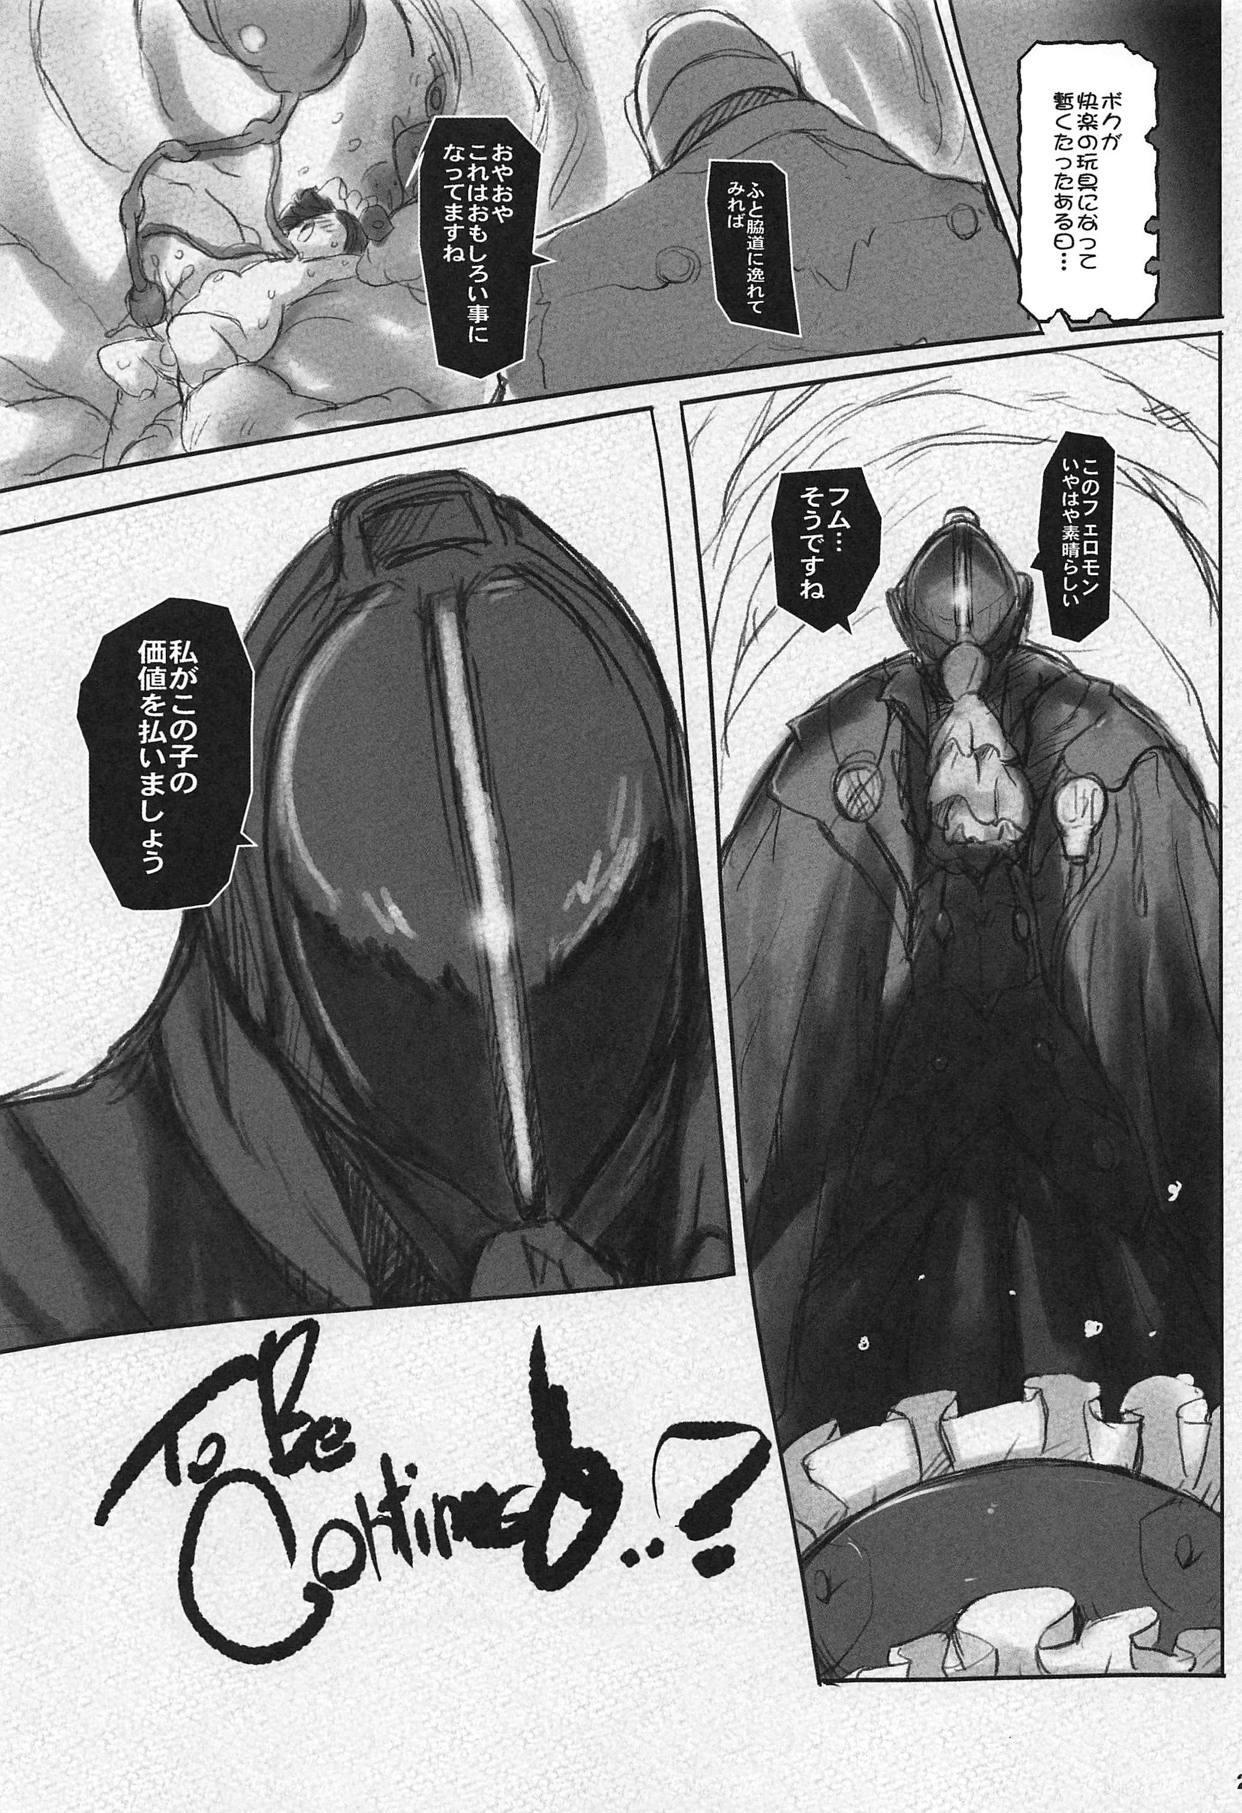 (C95) [Kachusha (Chomes)] Marulk-chan-kun no Abyss (Made in Abyss) 27